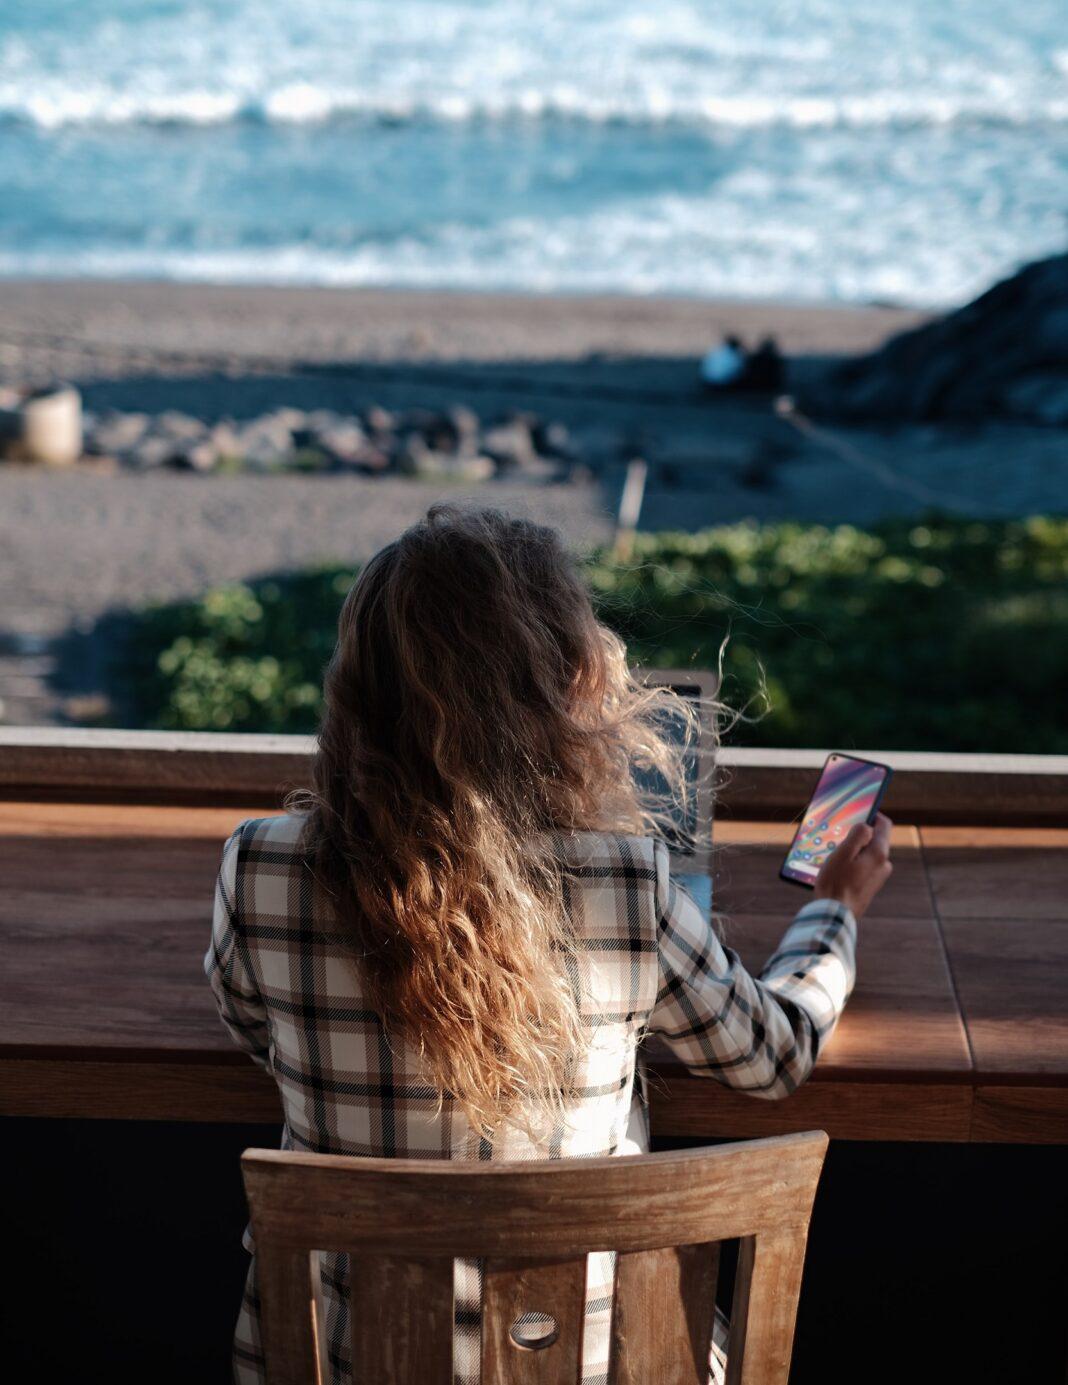 Wiko sfata i 5 stereotipi sul Nomadismo Digitale